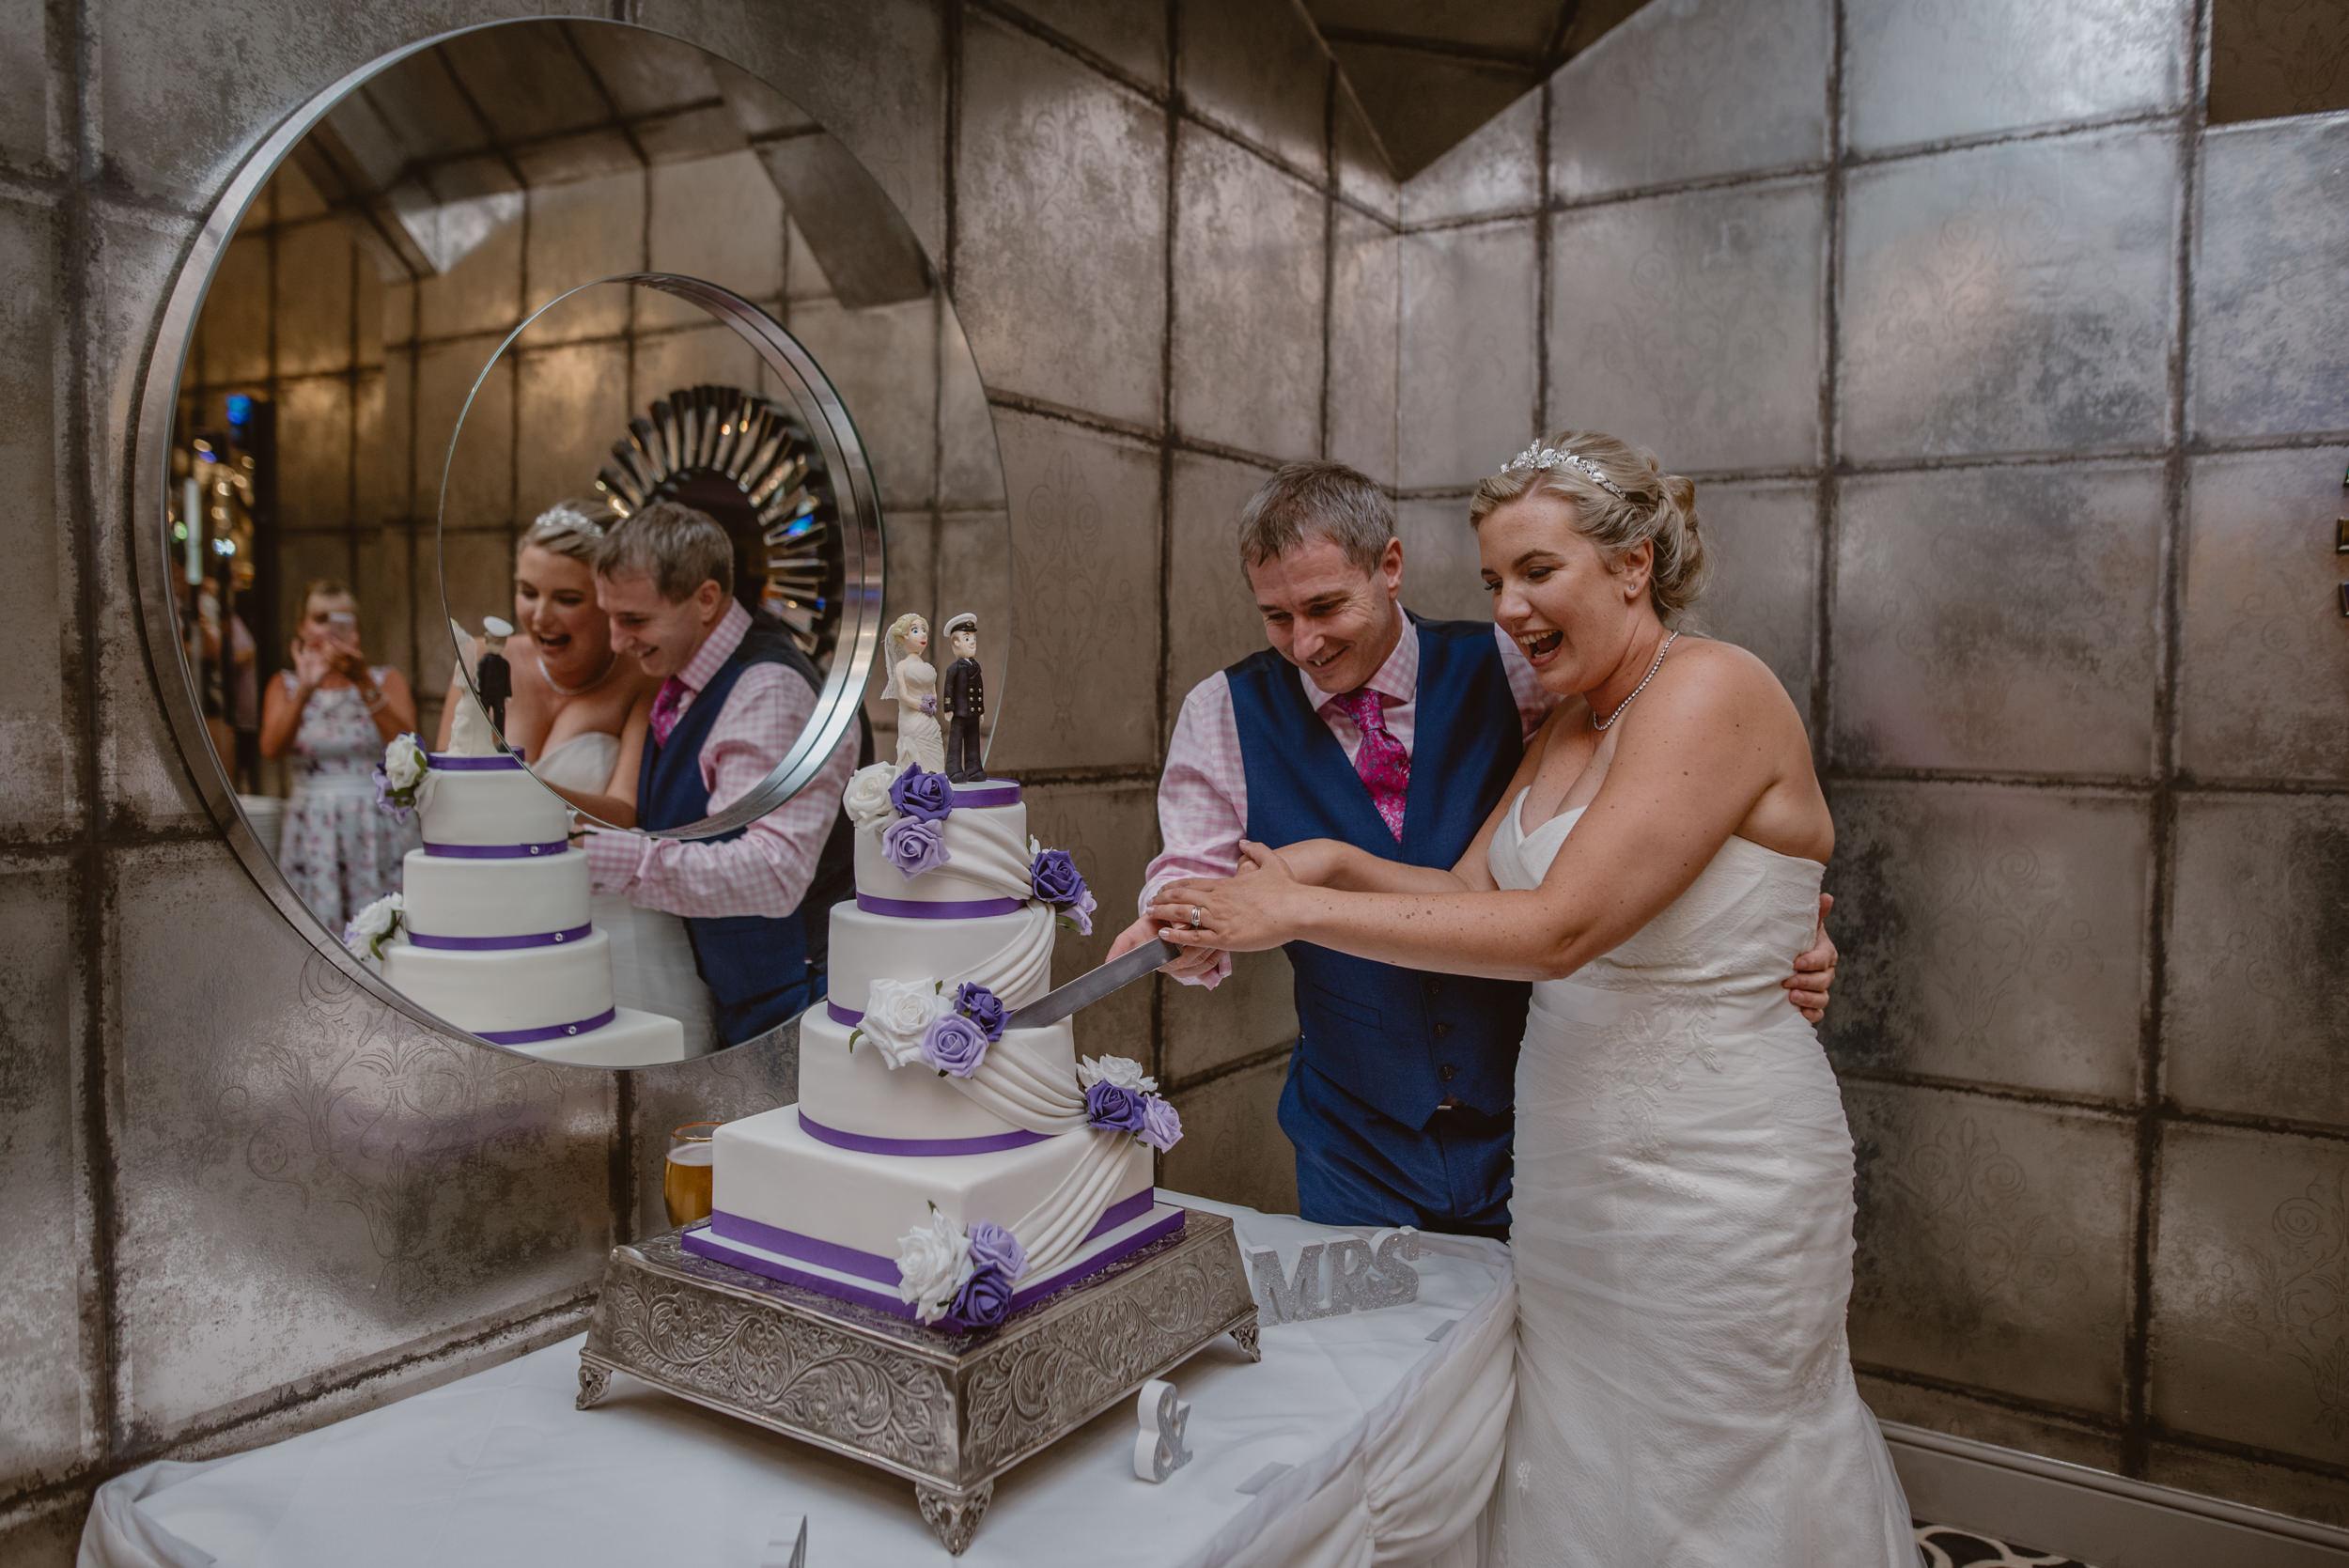 Chantelle-and-Stephen-Old-Thorns-Hotel-Wedding-Liphook-Manu-Mendoza-Wedding-Photography-529.jpg